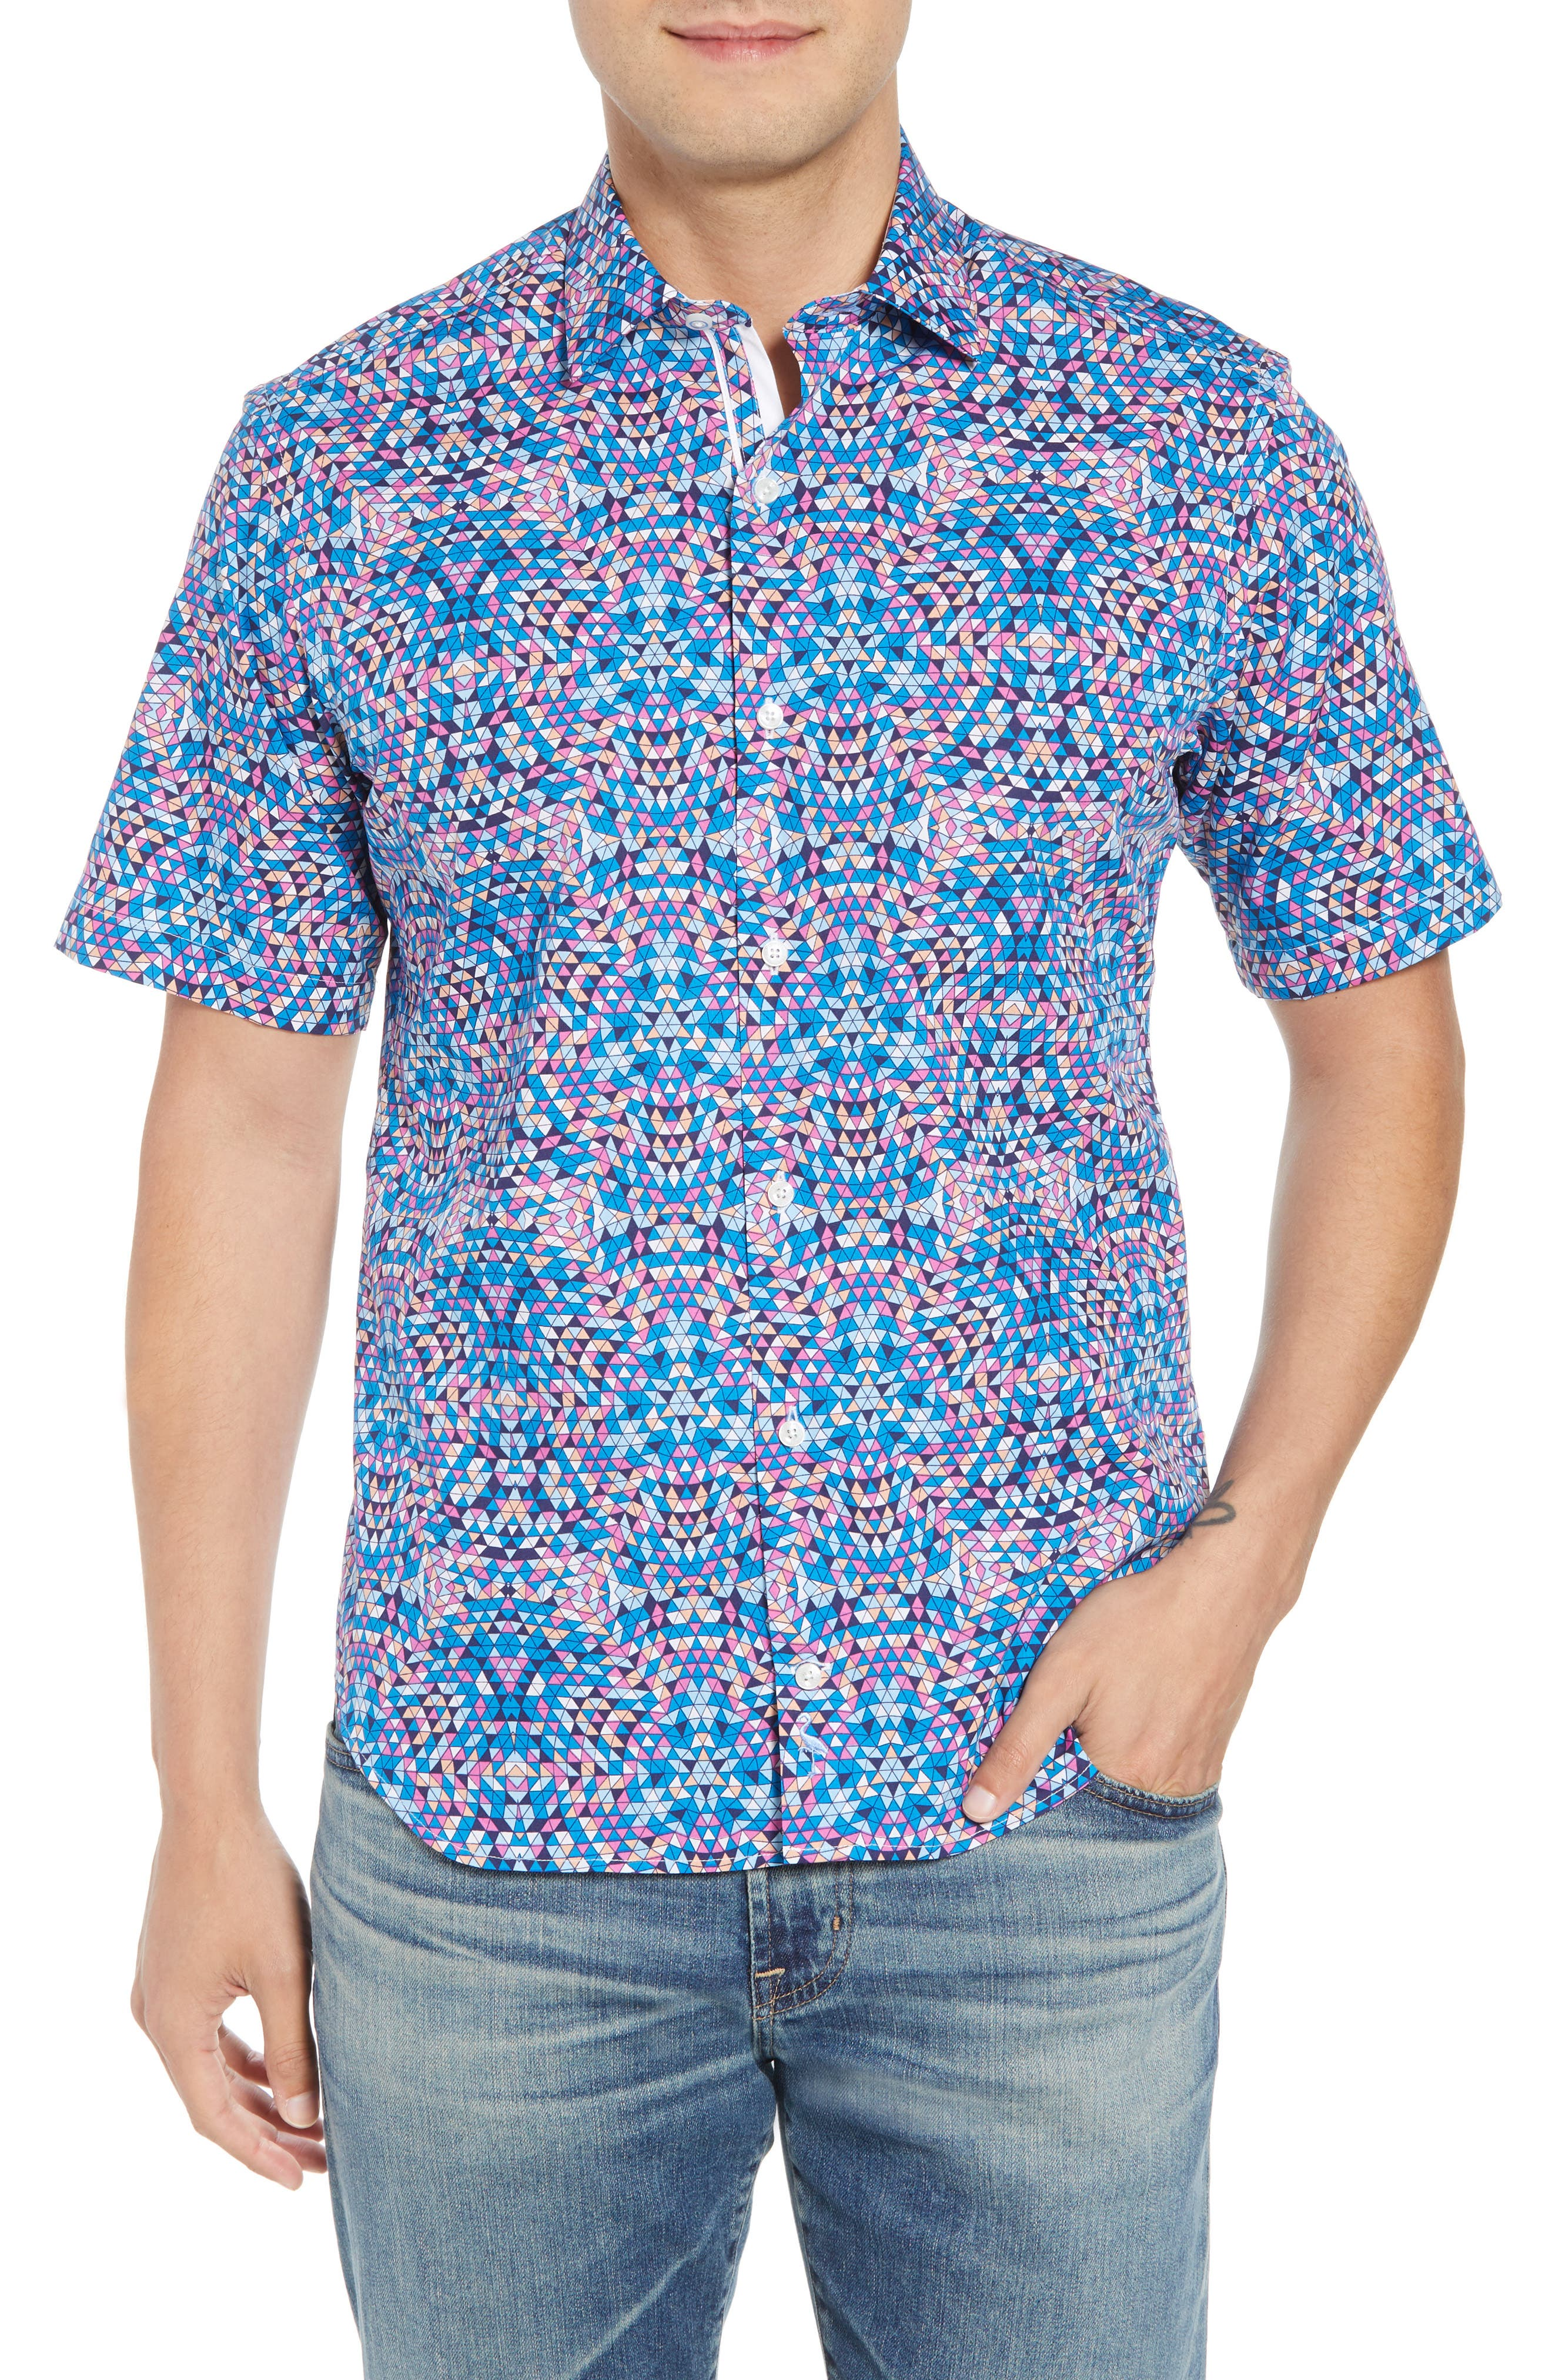 Anton Regular Fit Sport Shirt,                         Main,                         color, Teal